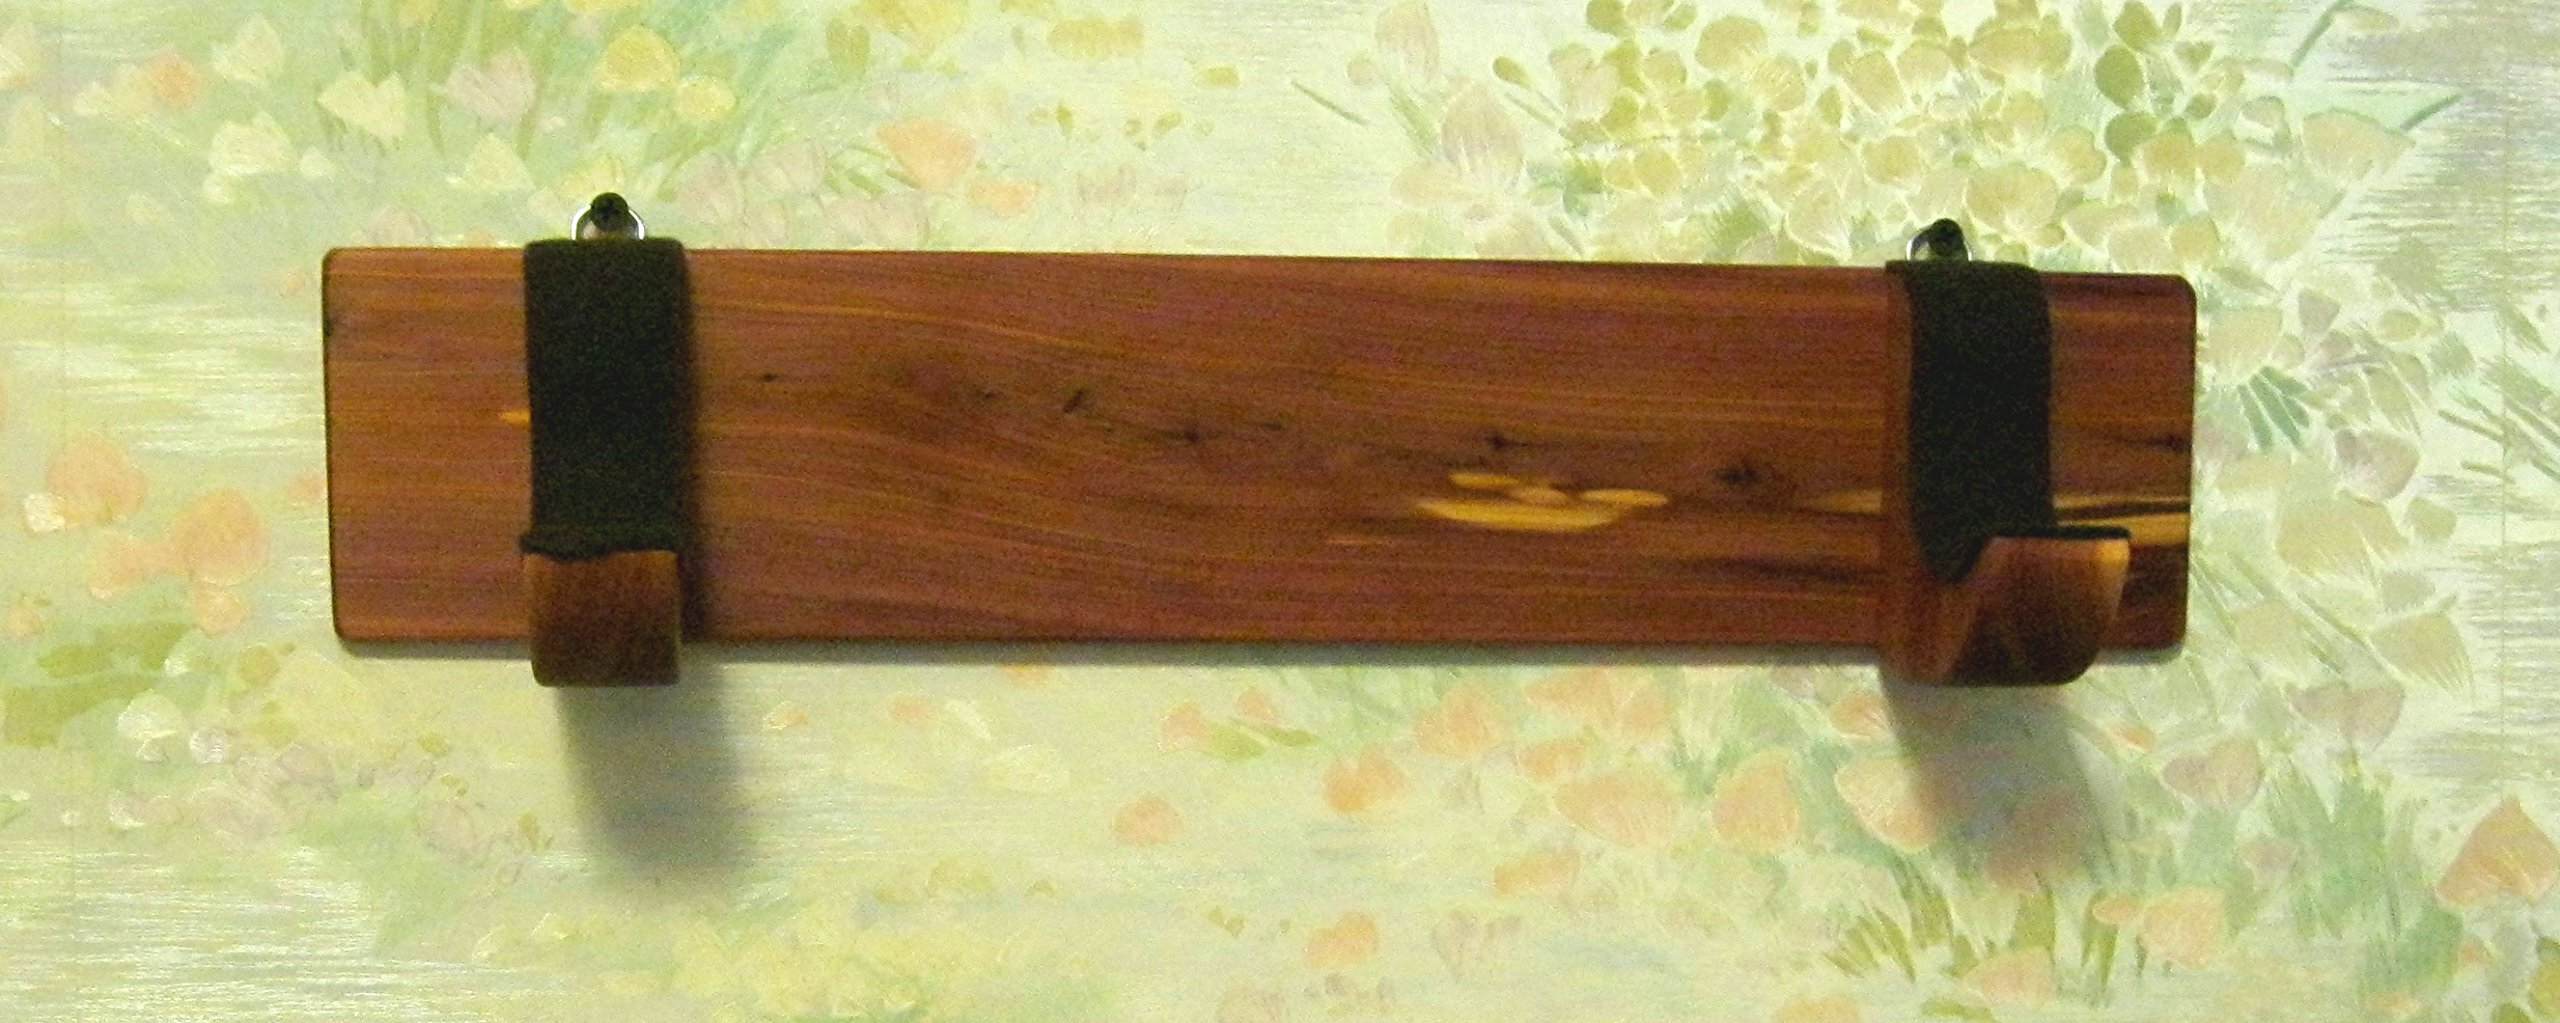 Native American Flute - Wall Rack - - handmade from aromatic cedar